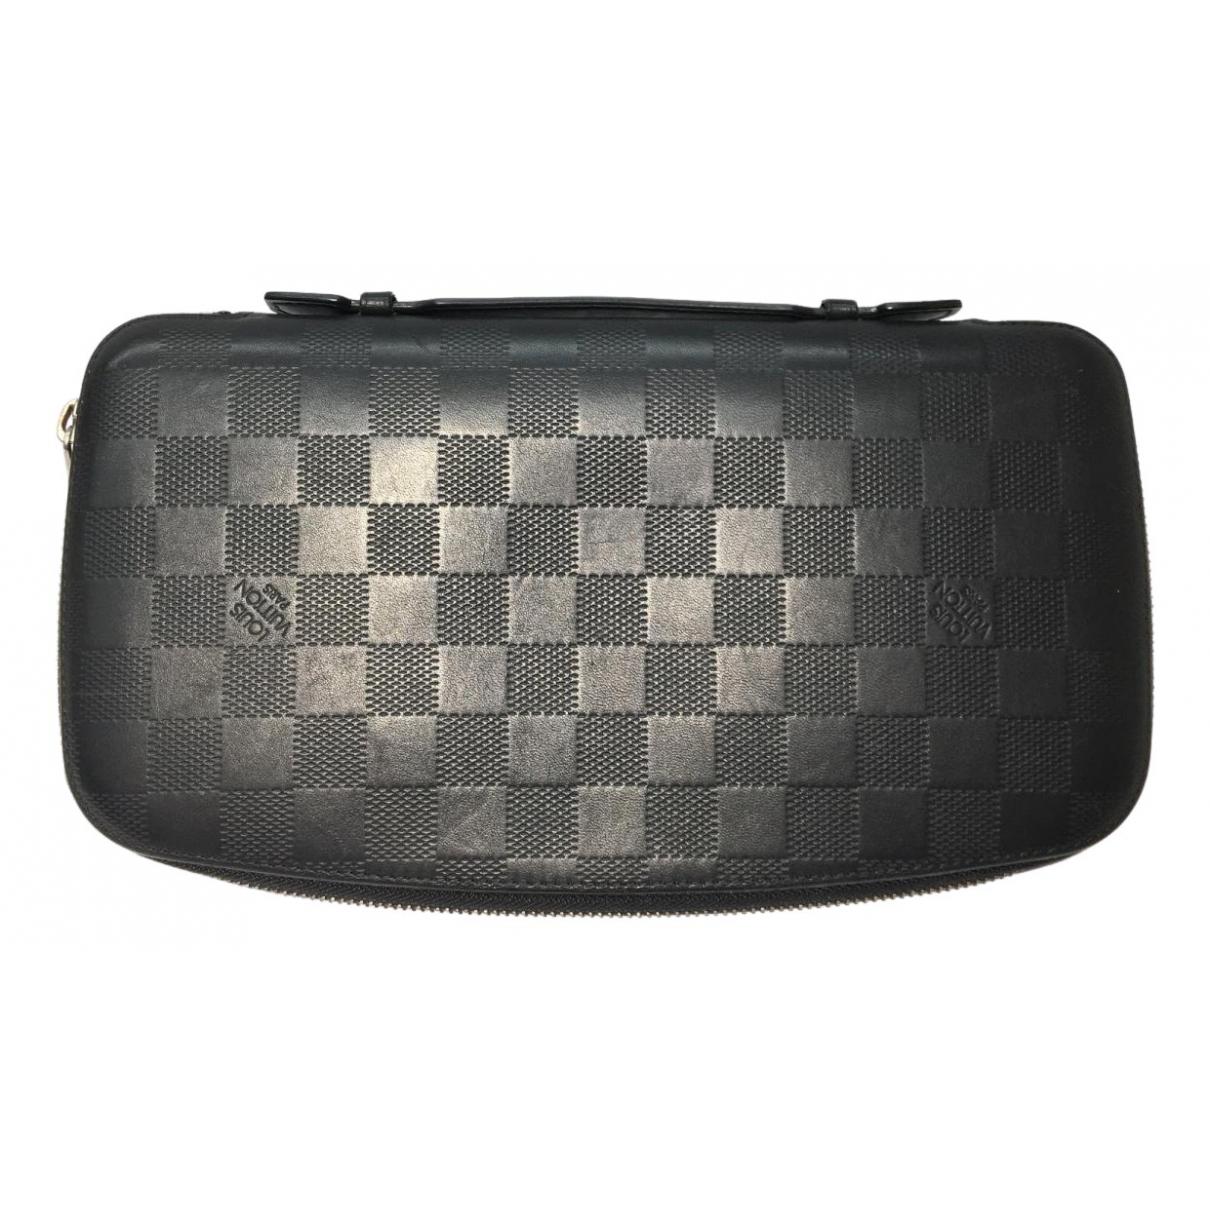 Louis Vuitton Zippy XL Black Leather Small bag, wallet & cases for Men \N